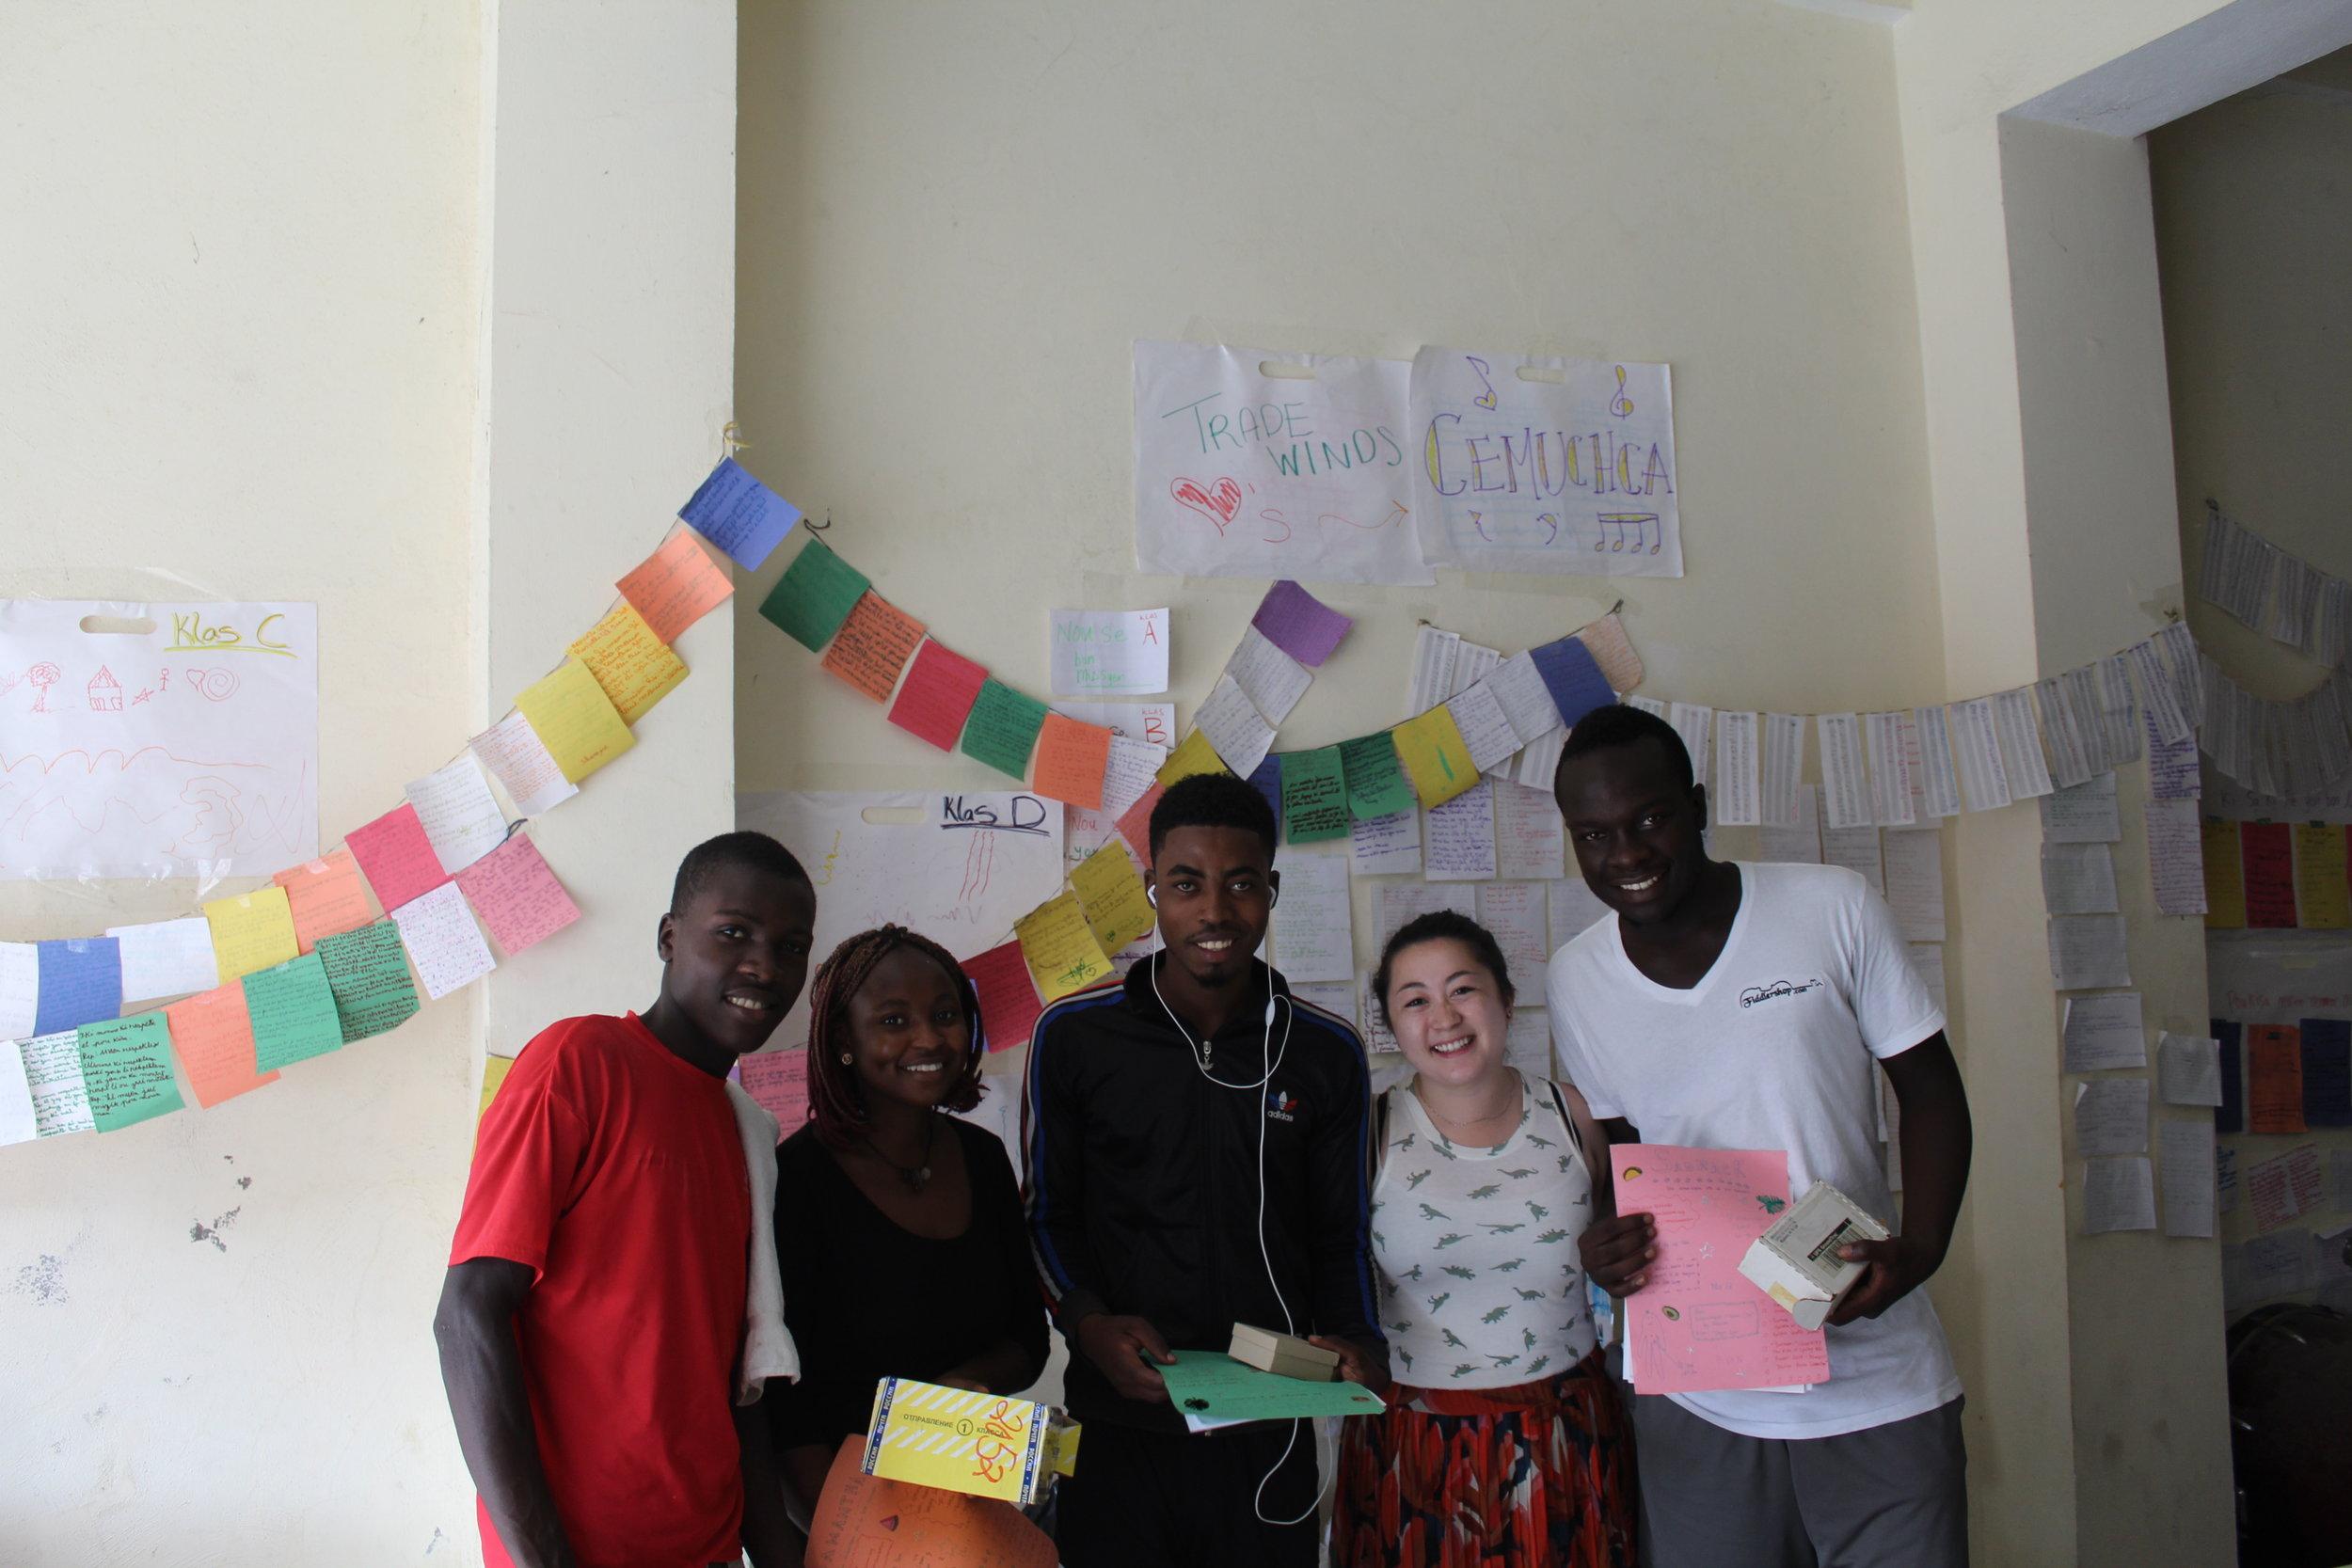 Midori Samson Cap-Haitien Haiti CEMUCHCA with Students.JPG